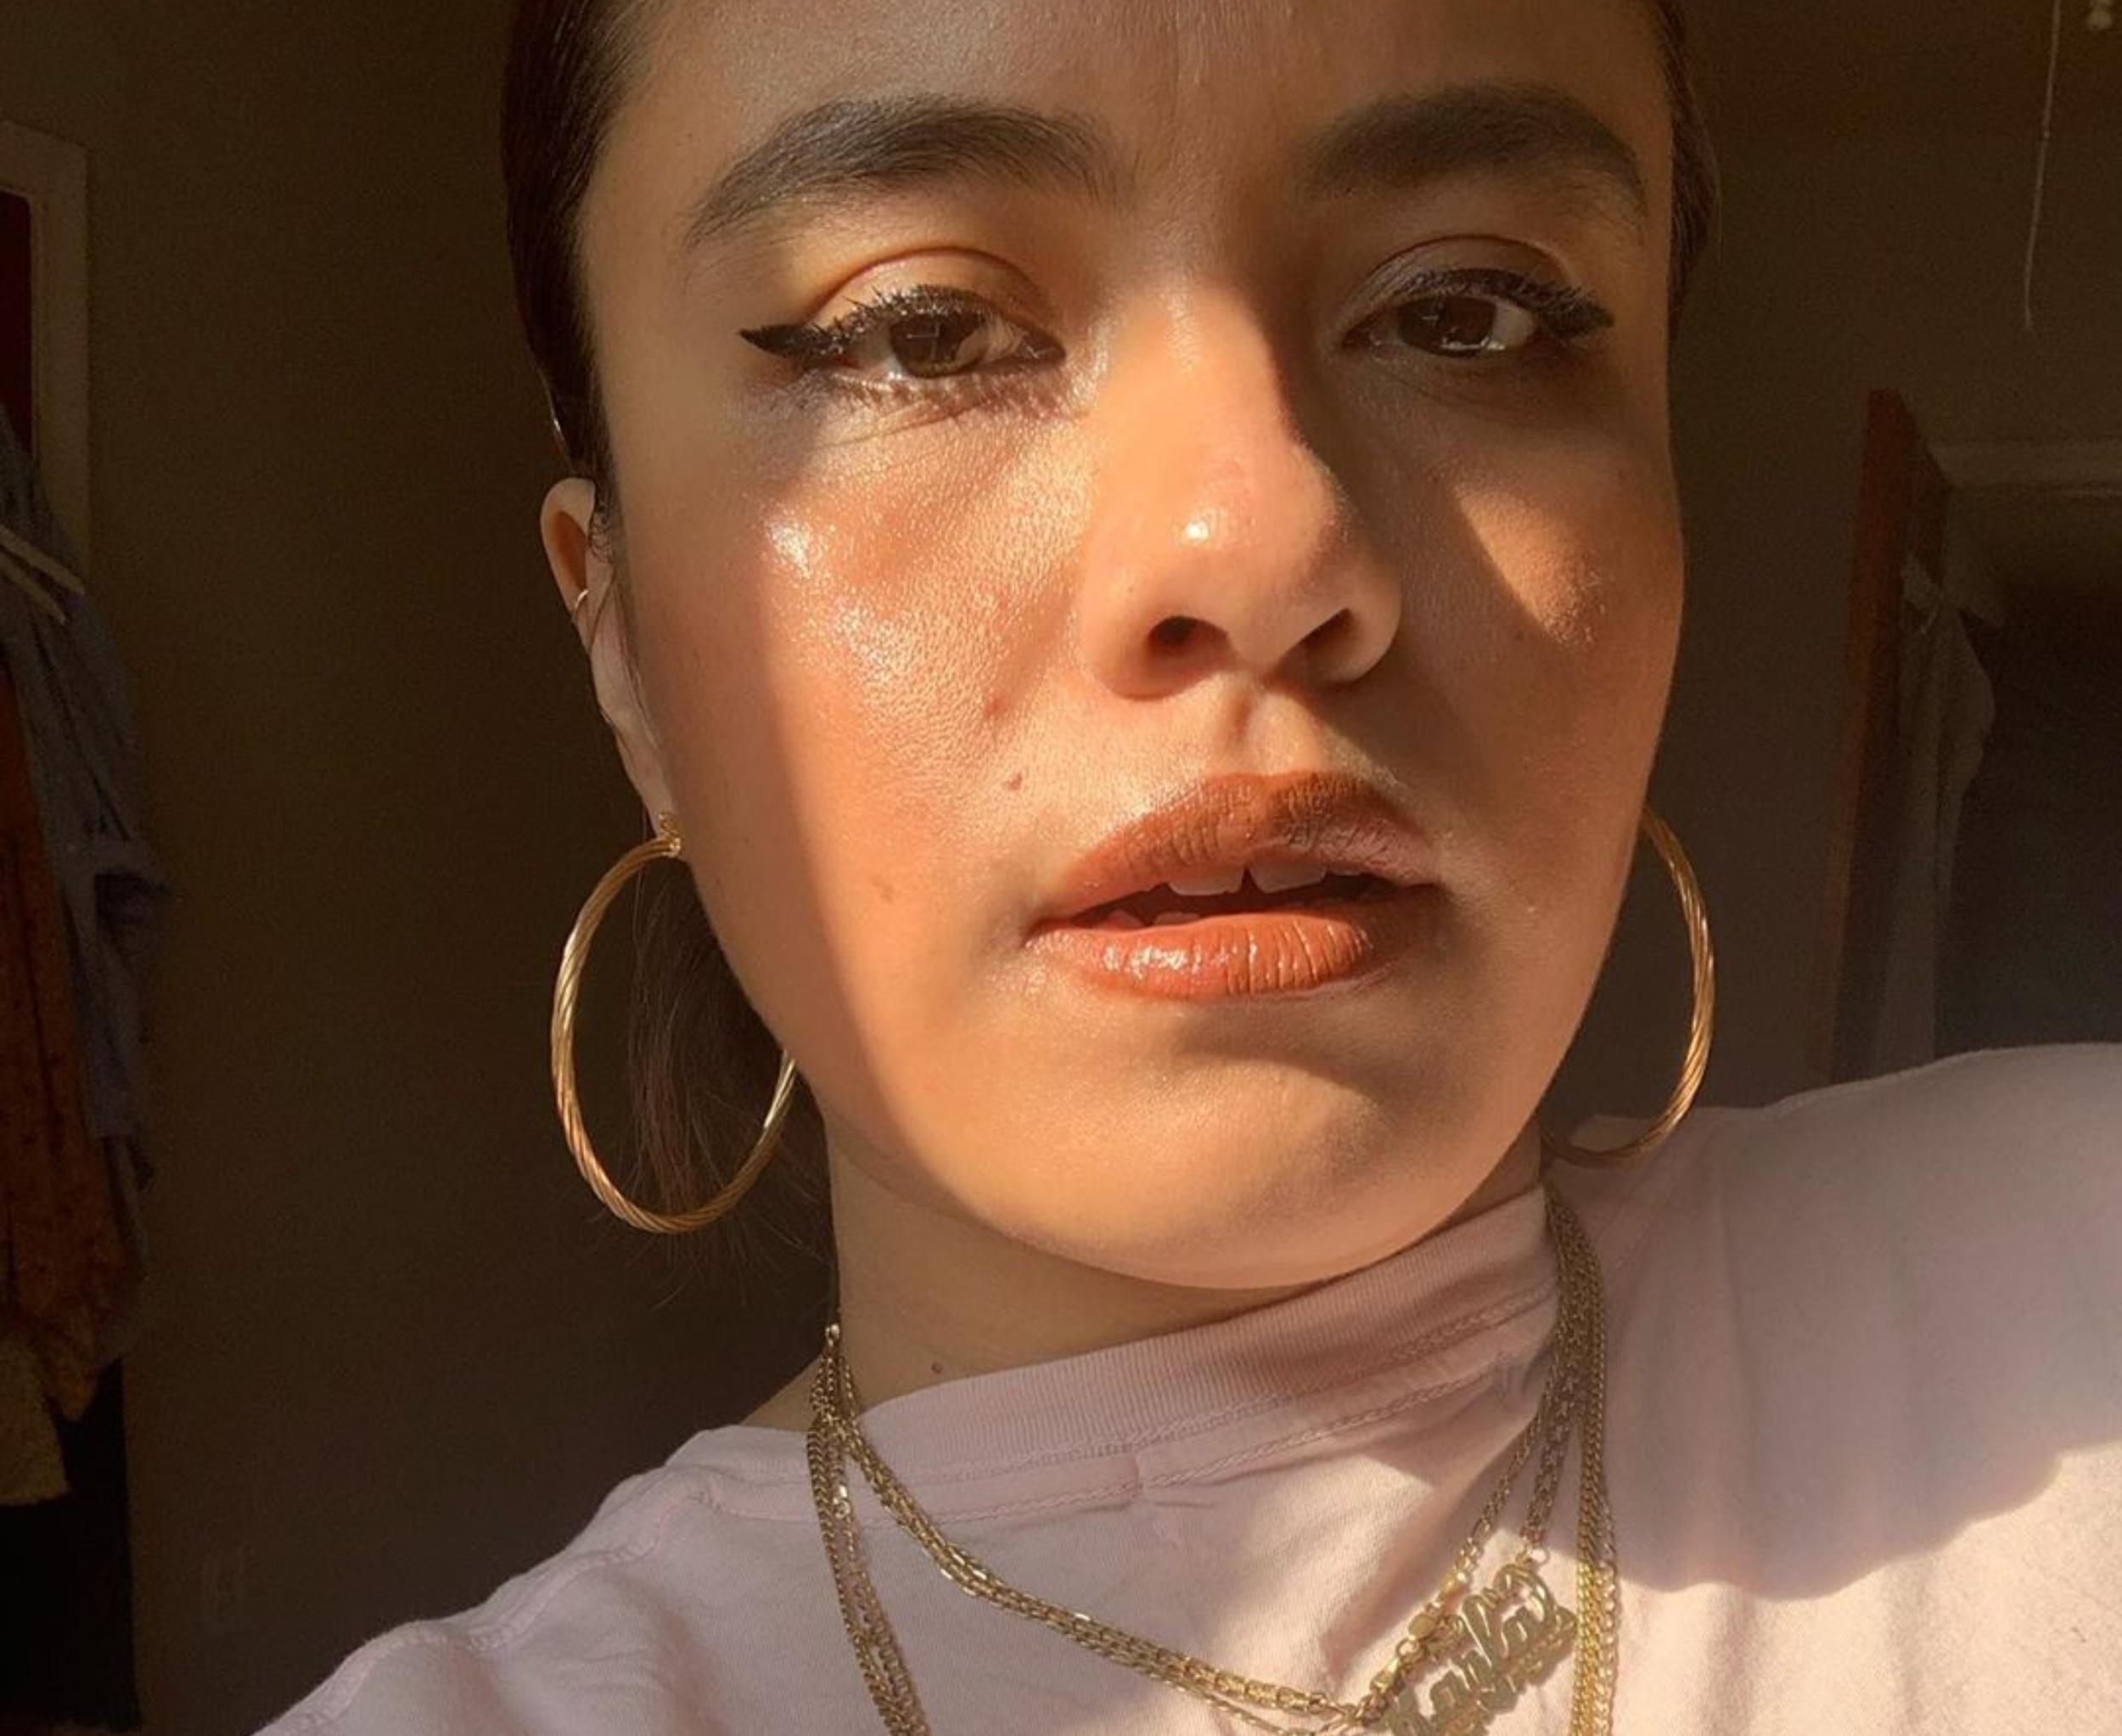 Author Karla Cornejo Villavicencio, who wears gold jewelry and takes a selfie.